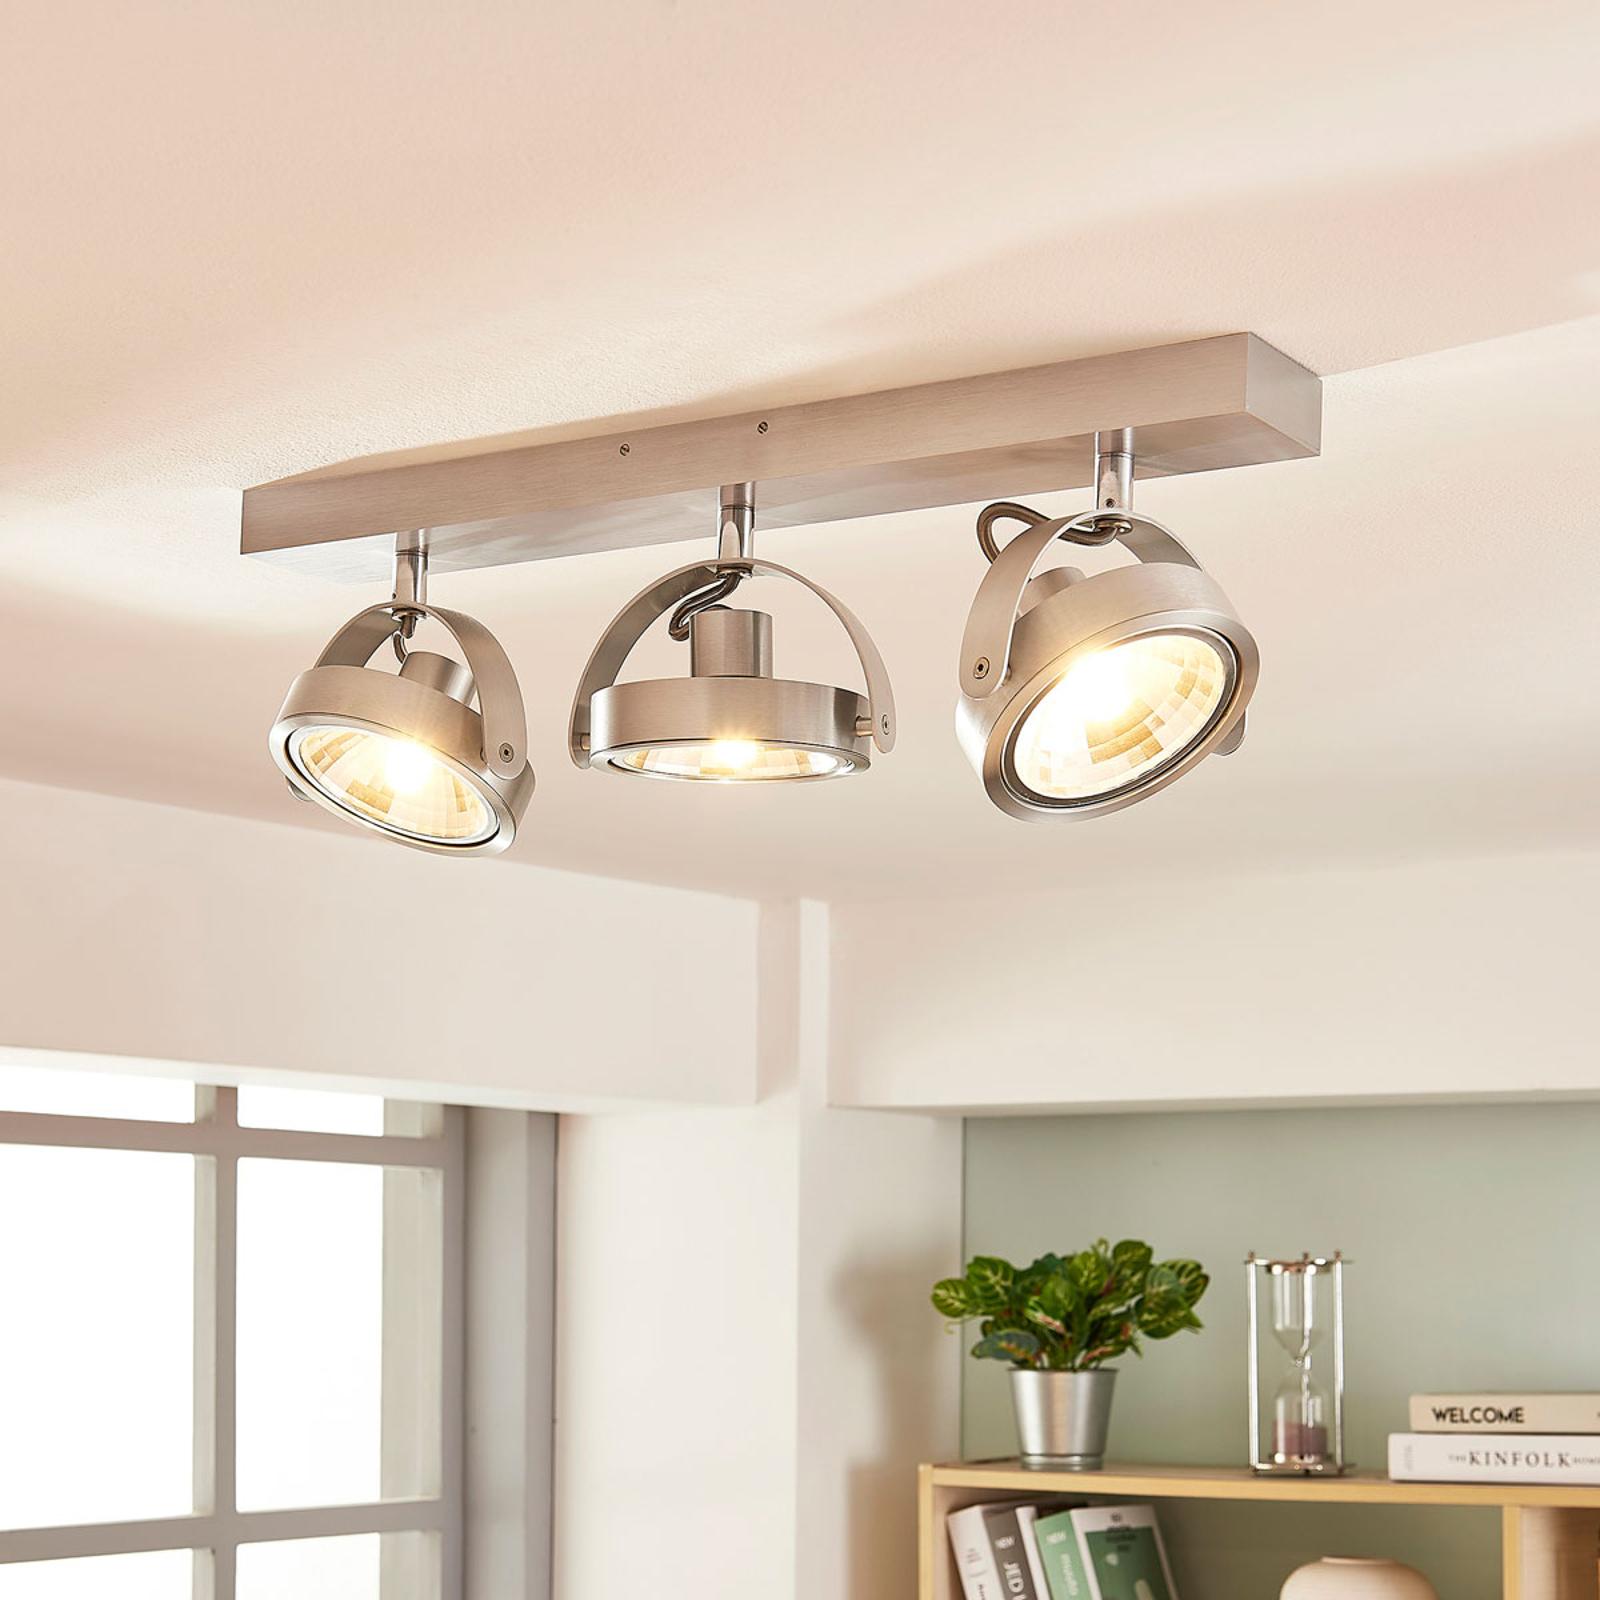 Plafonnier avec spots LED Lieven en alu, 3 lampes